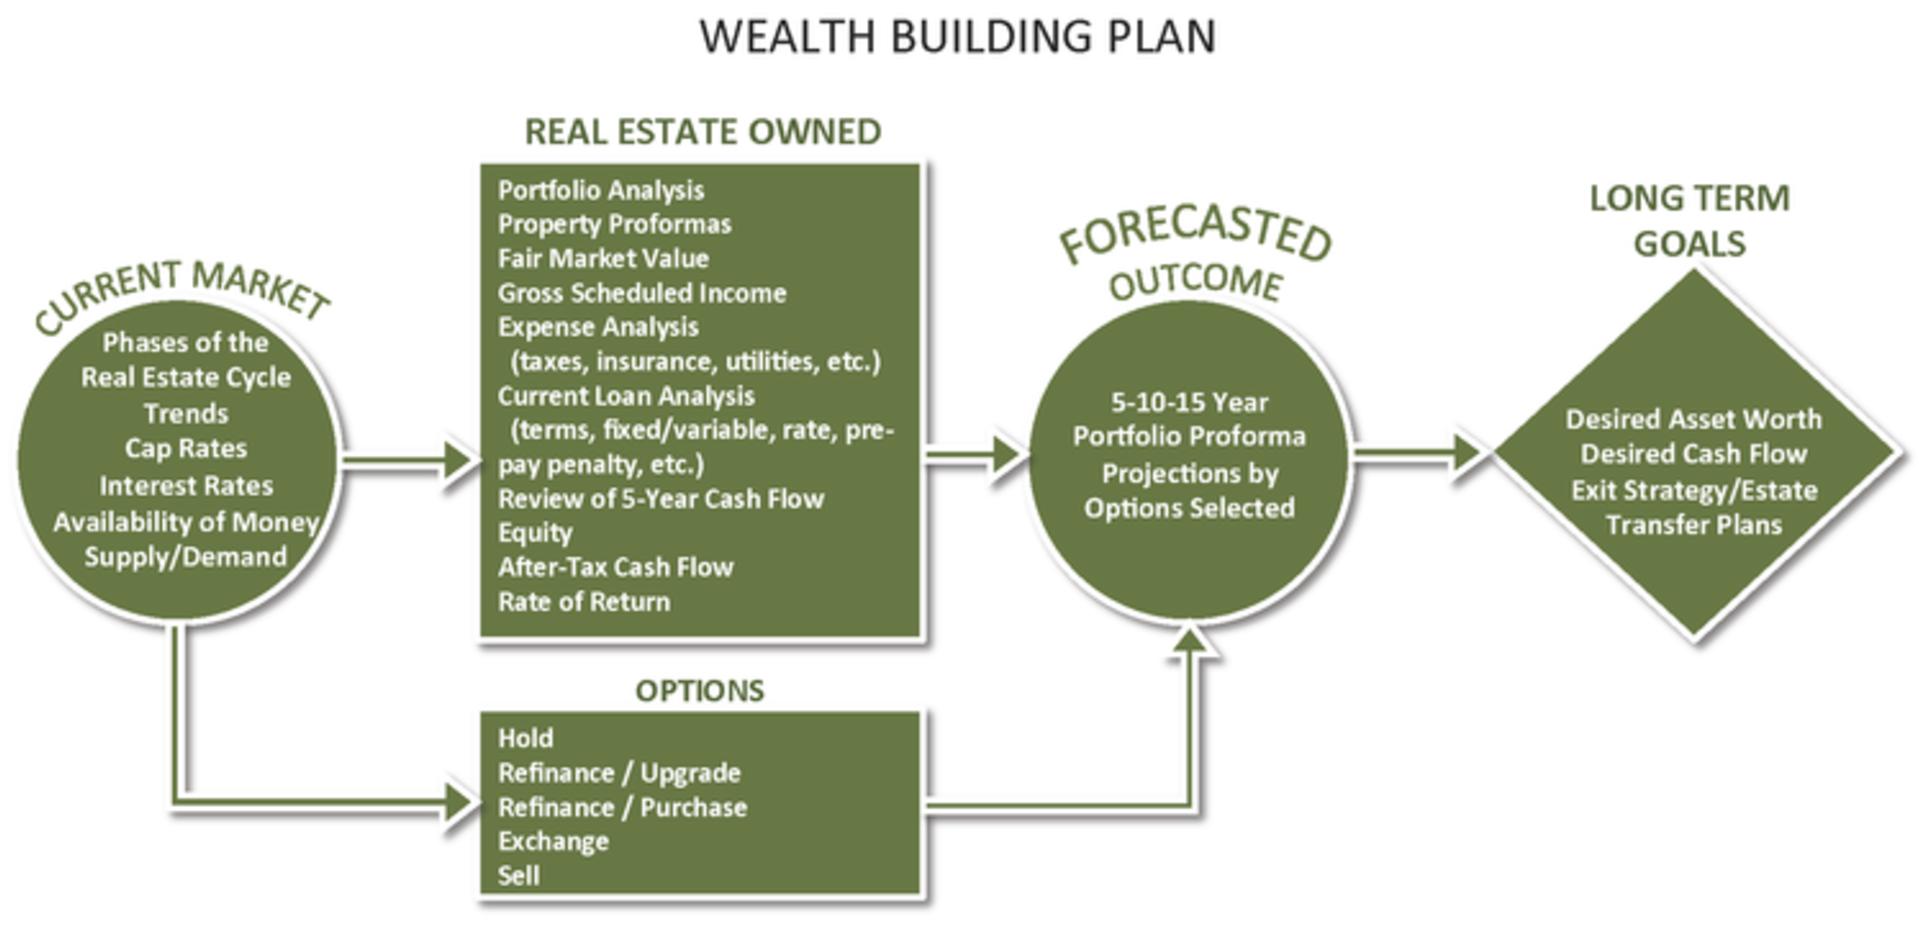 Wealth Building Plan